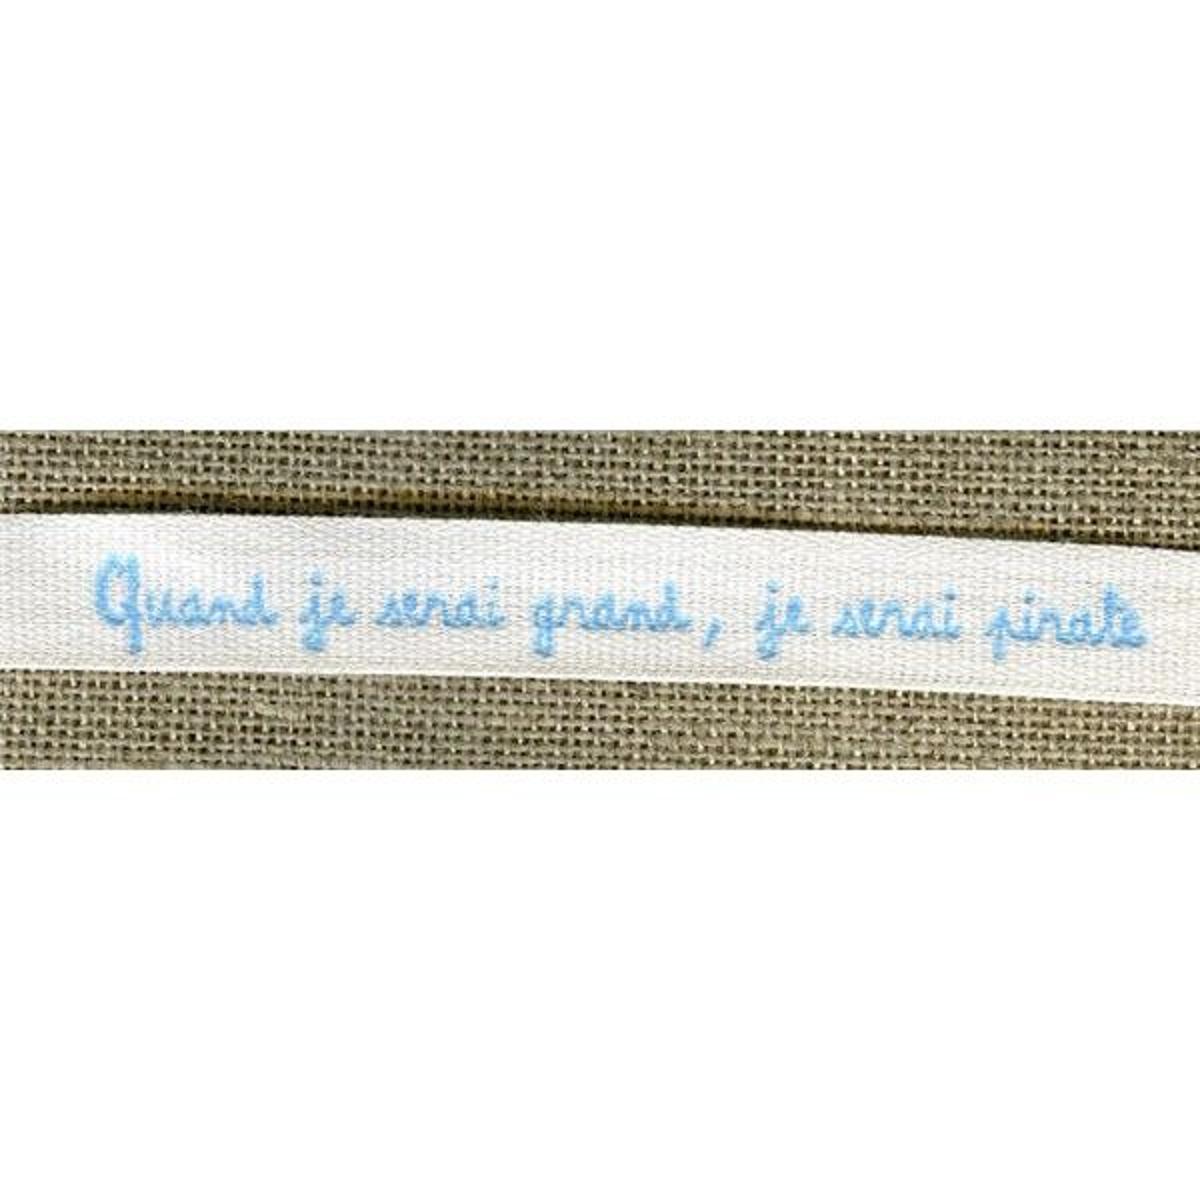 Ruban Imprimé Blanc Lettrage Bleu: Quand Je Serai Grand